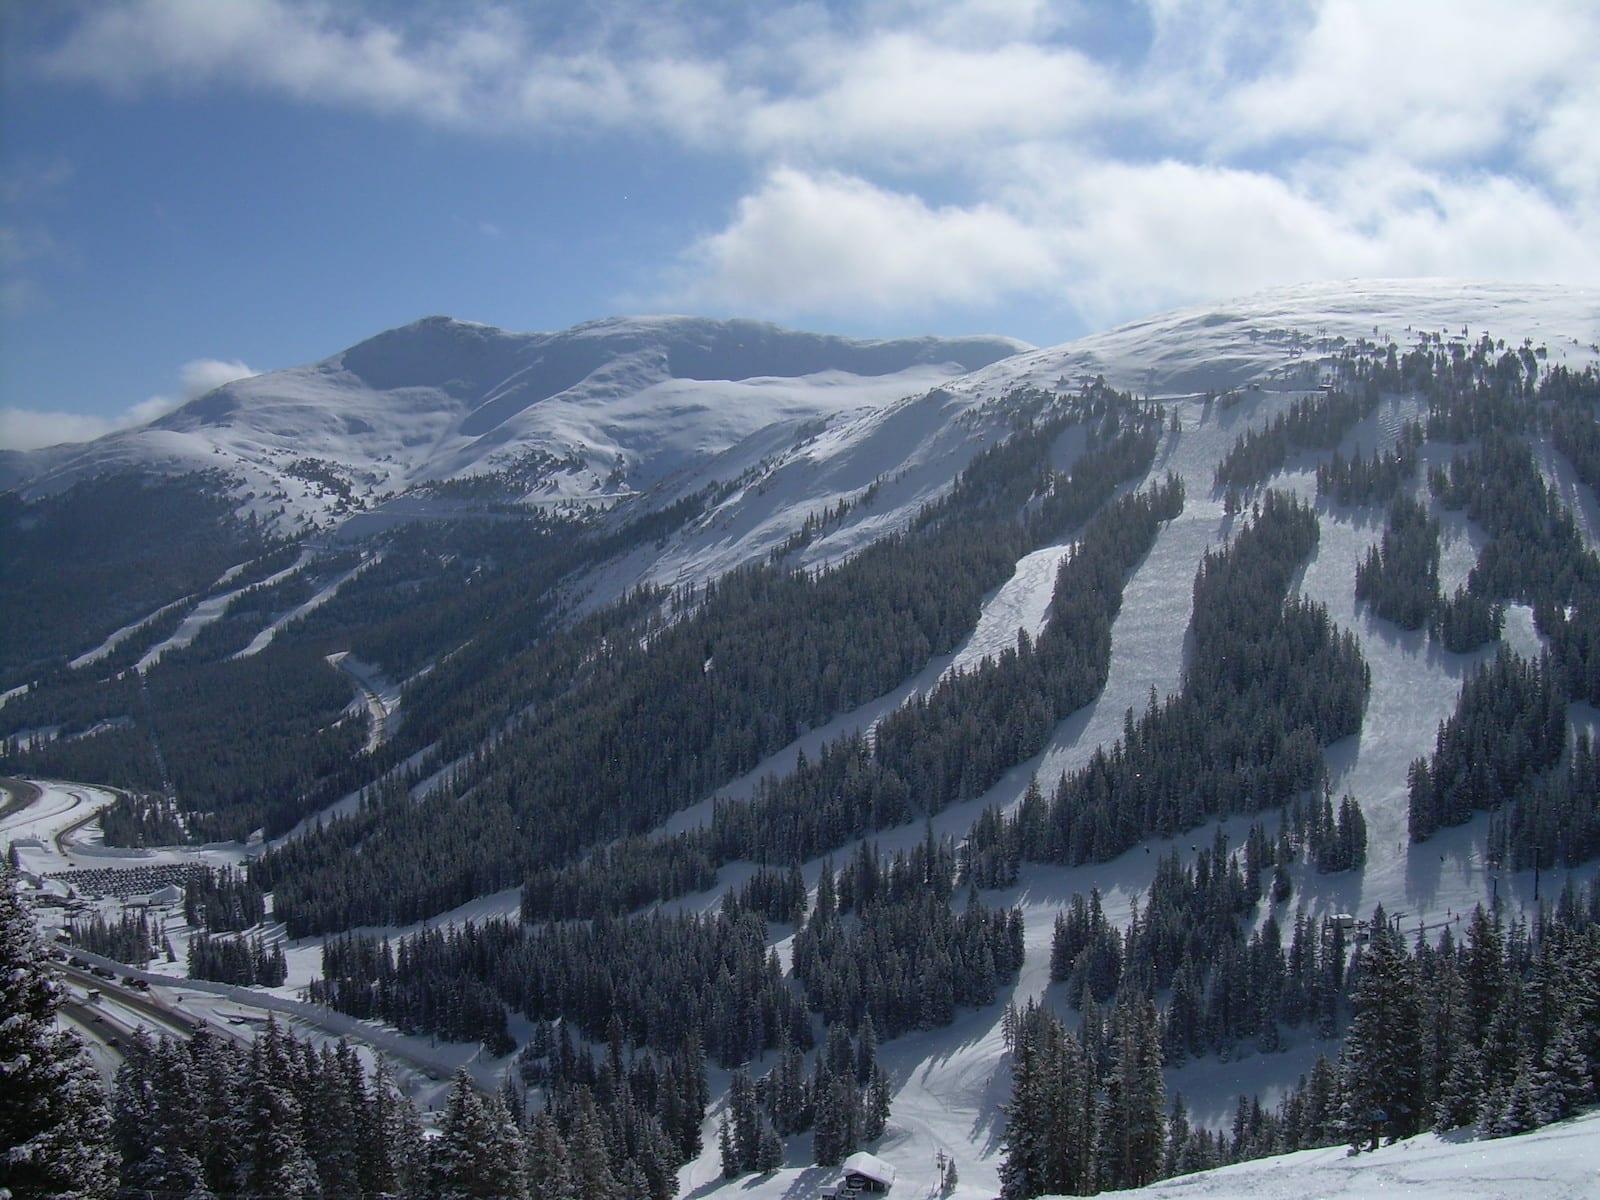 Loveland Ski Area Interstate 70 Colorado